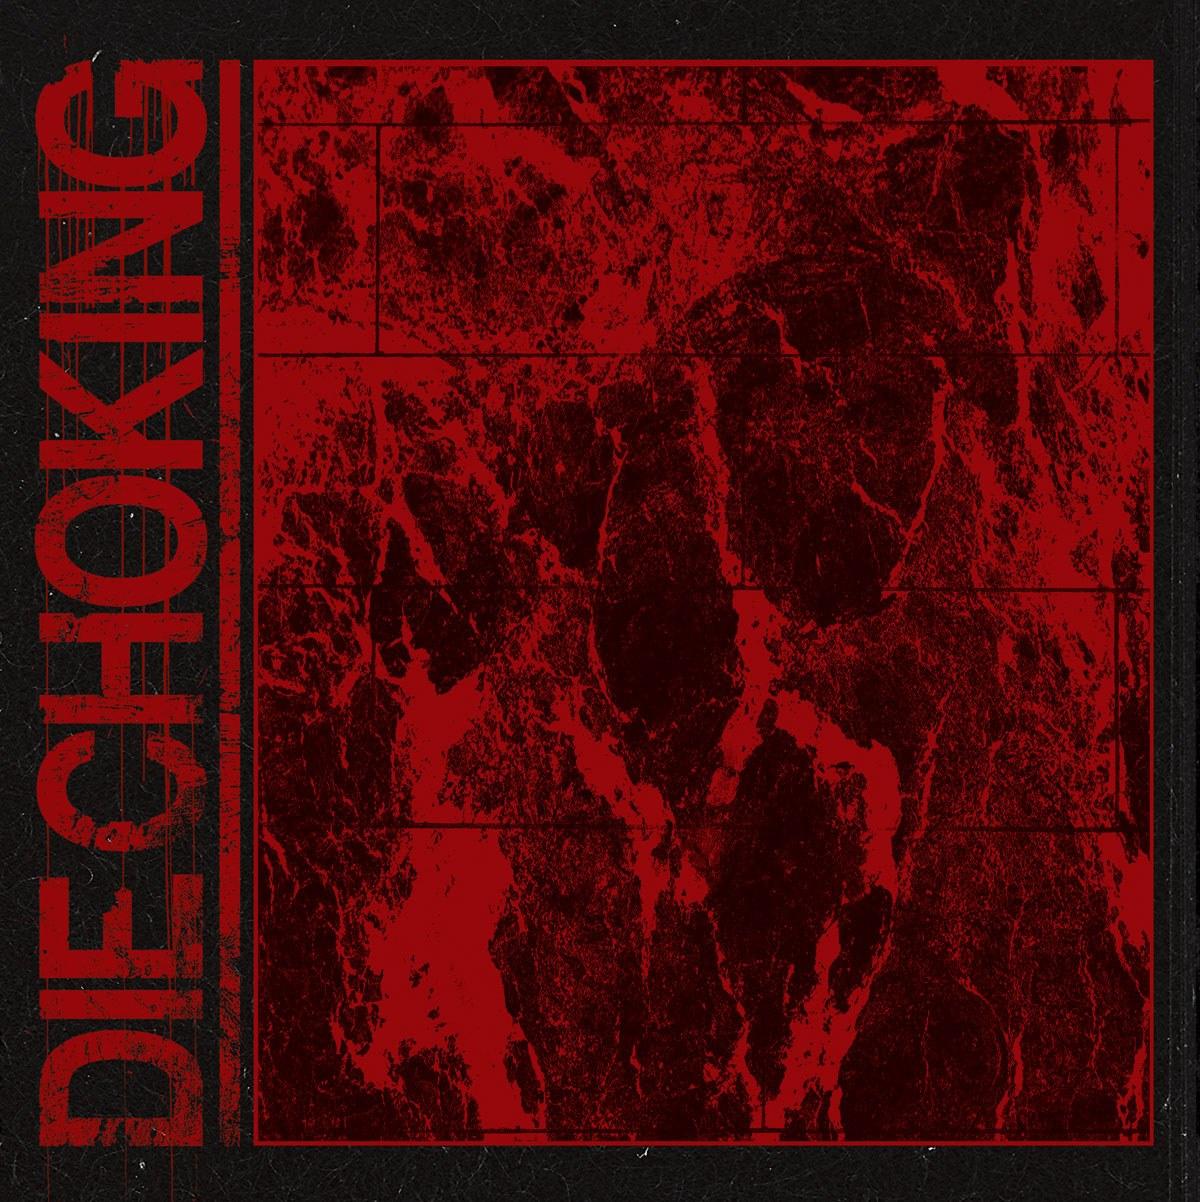 DieChoking_EP2_CoverArt.jpg